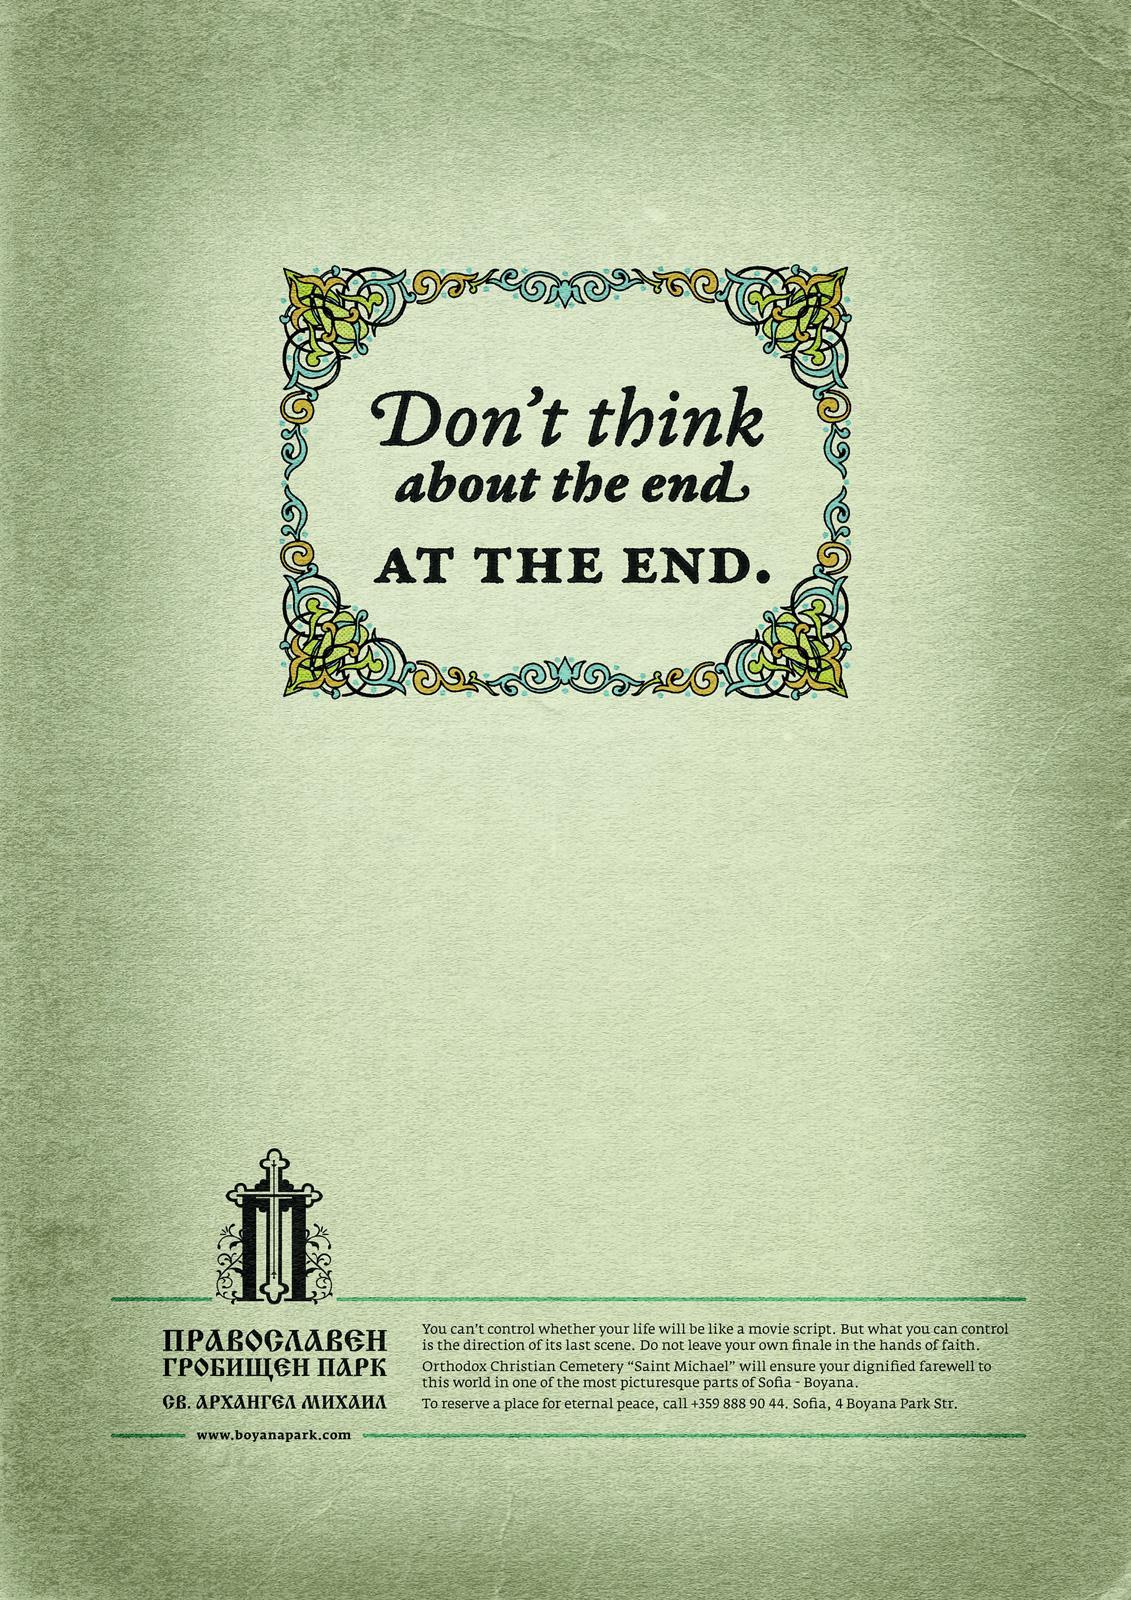 Saint Michael Orthodox Christian Cemetery Print Ad -  Boyana Park, At the end